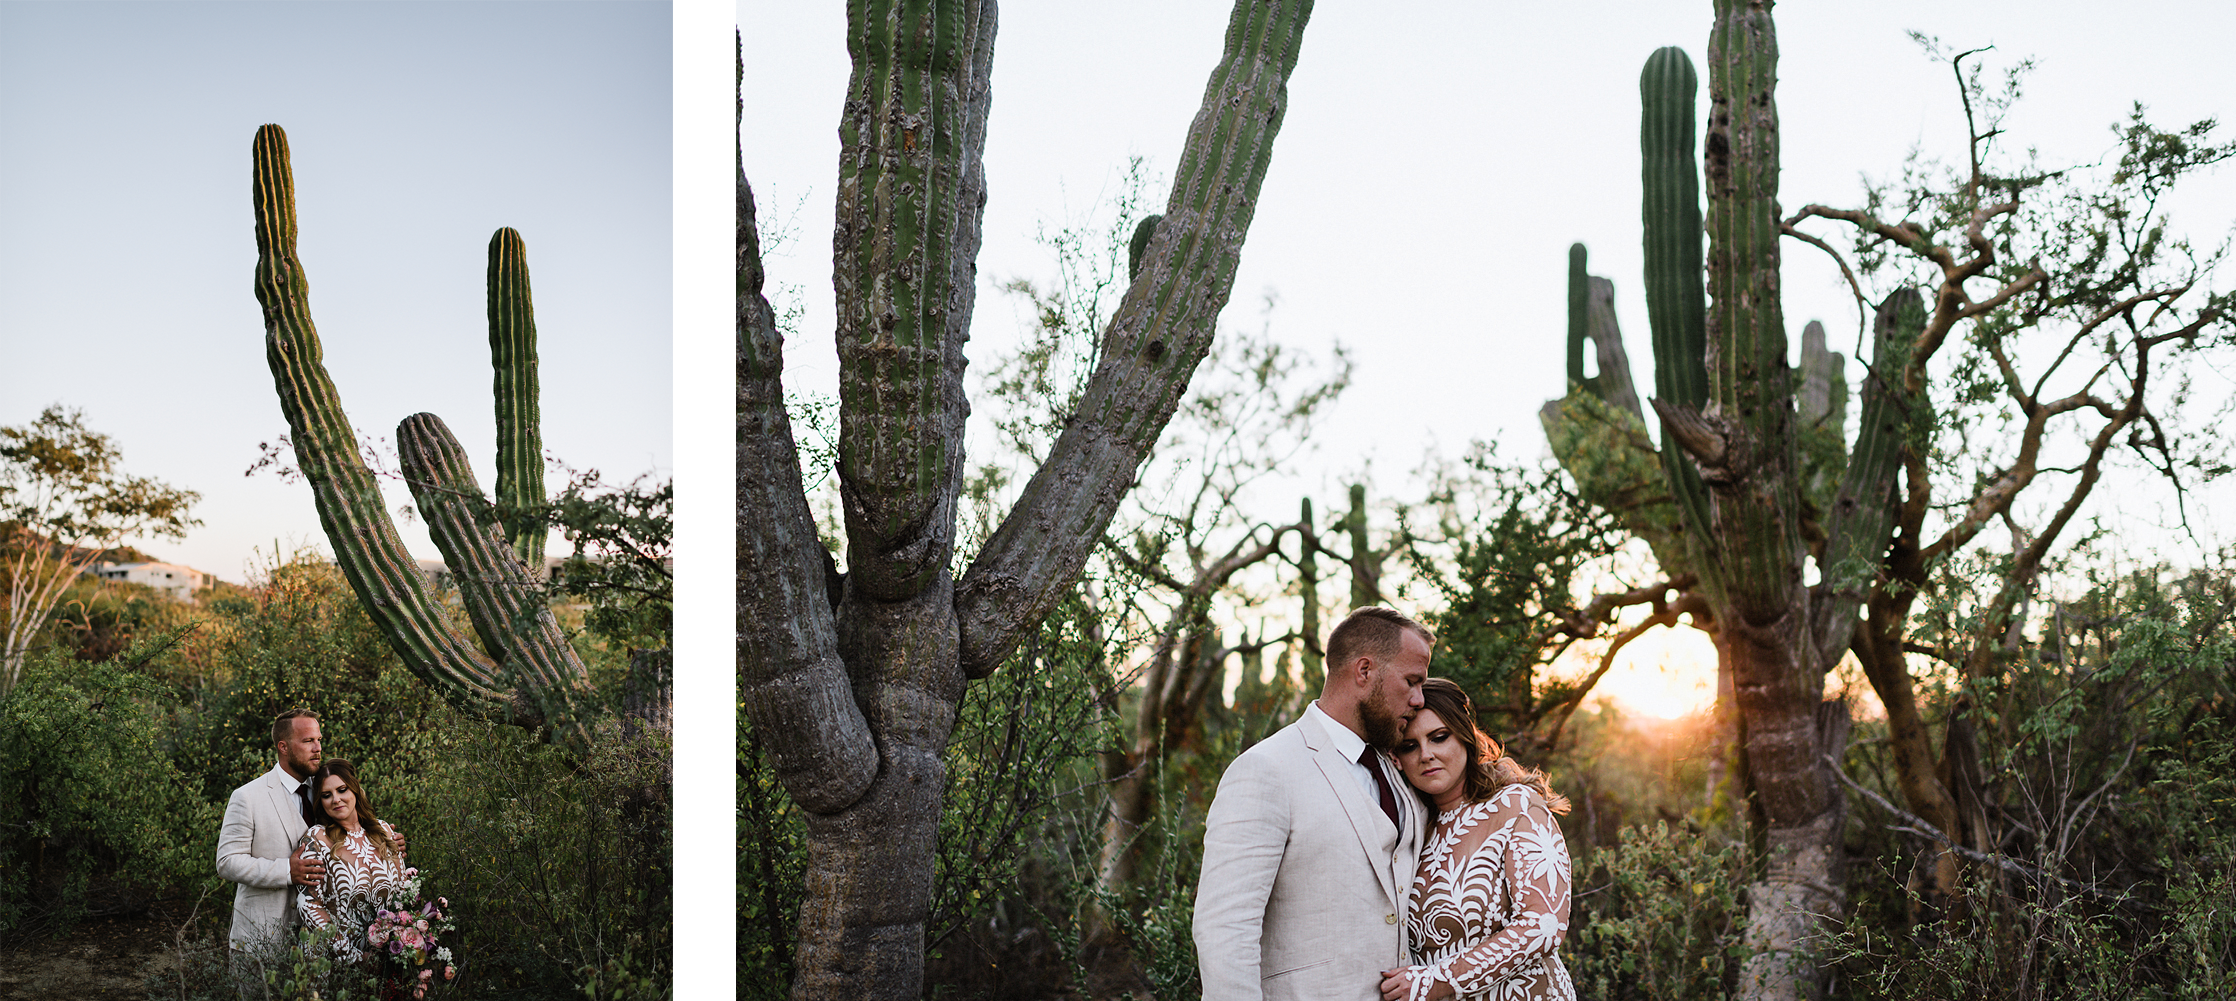 spread-15-destination-wedding-cabo-san-lucas-ventanas-private-residence-alternative-toronto-wedding-photographer-documentary-photojournalistic-portraits-bride-and-groom-portraits-intimate-real-moments-sunset-desert-epic-cactus-amazing.jpg